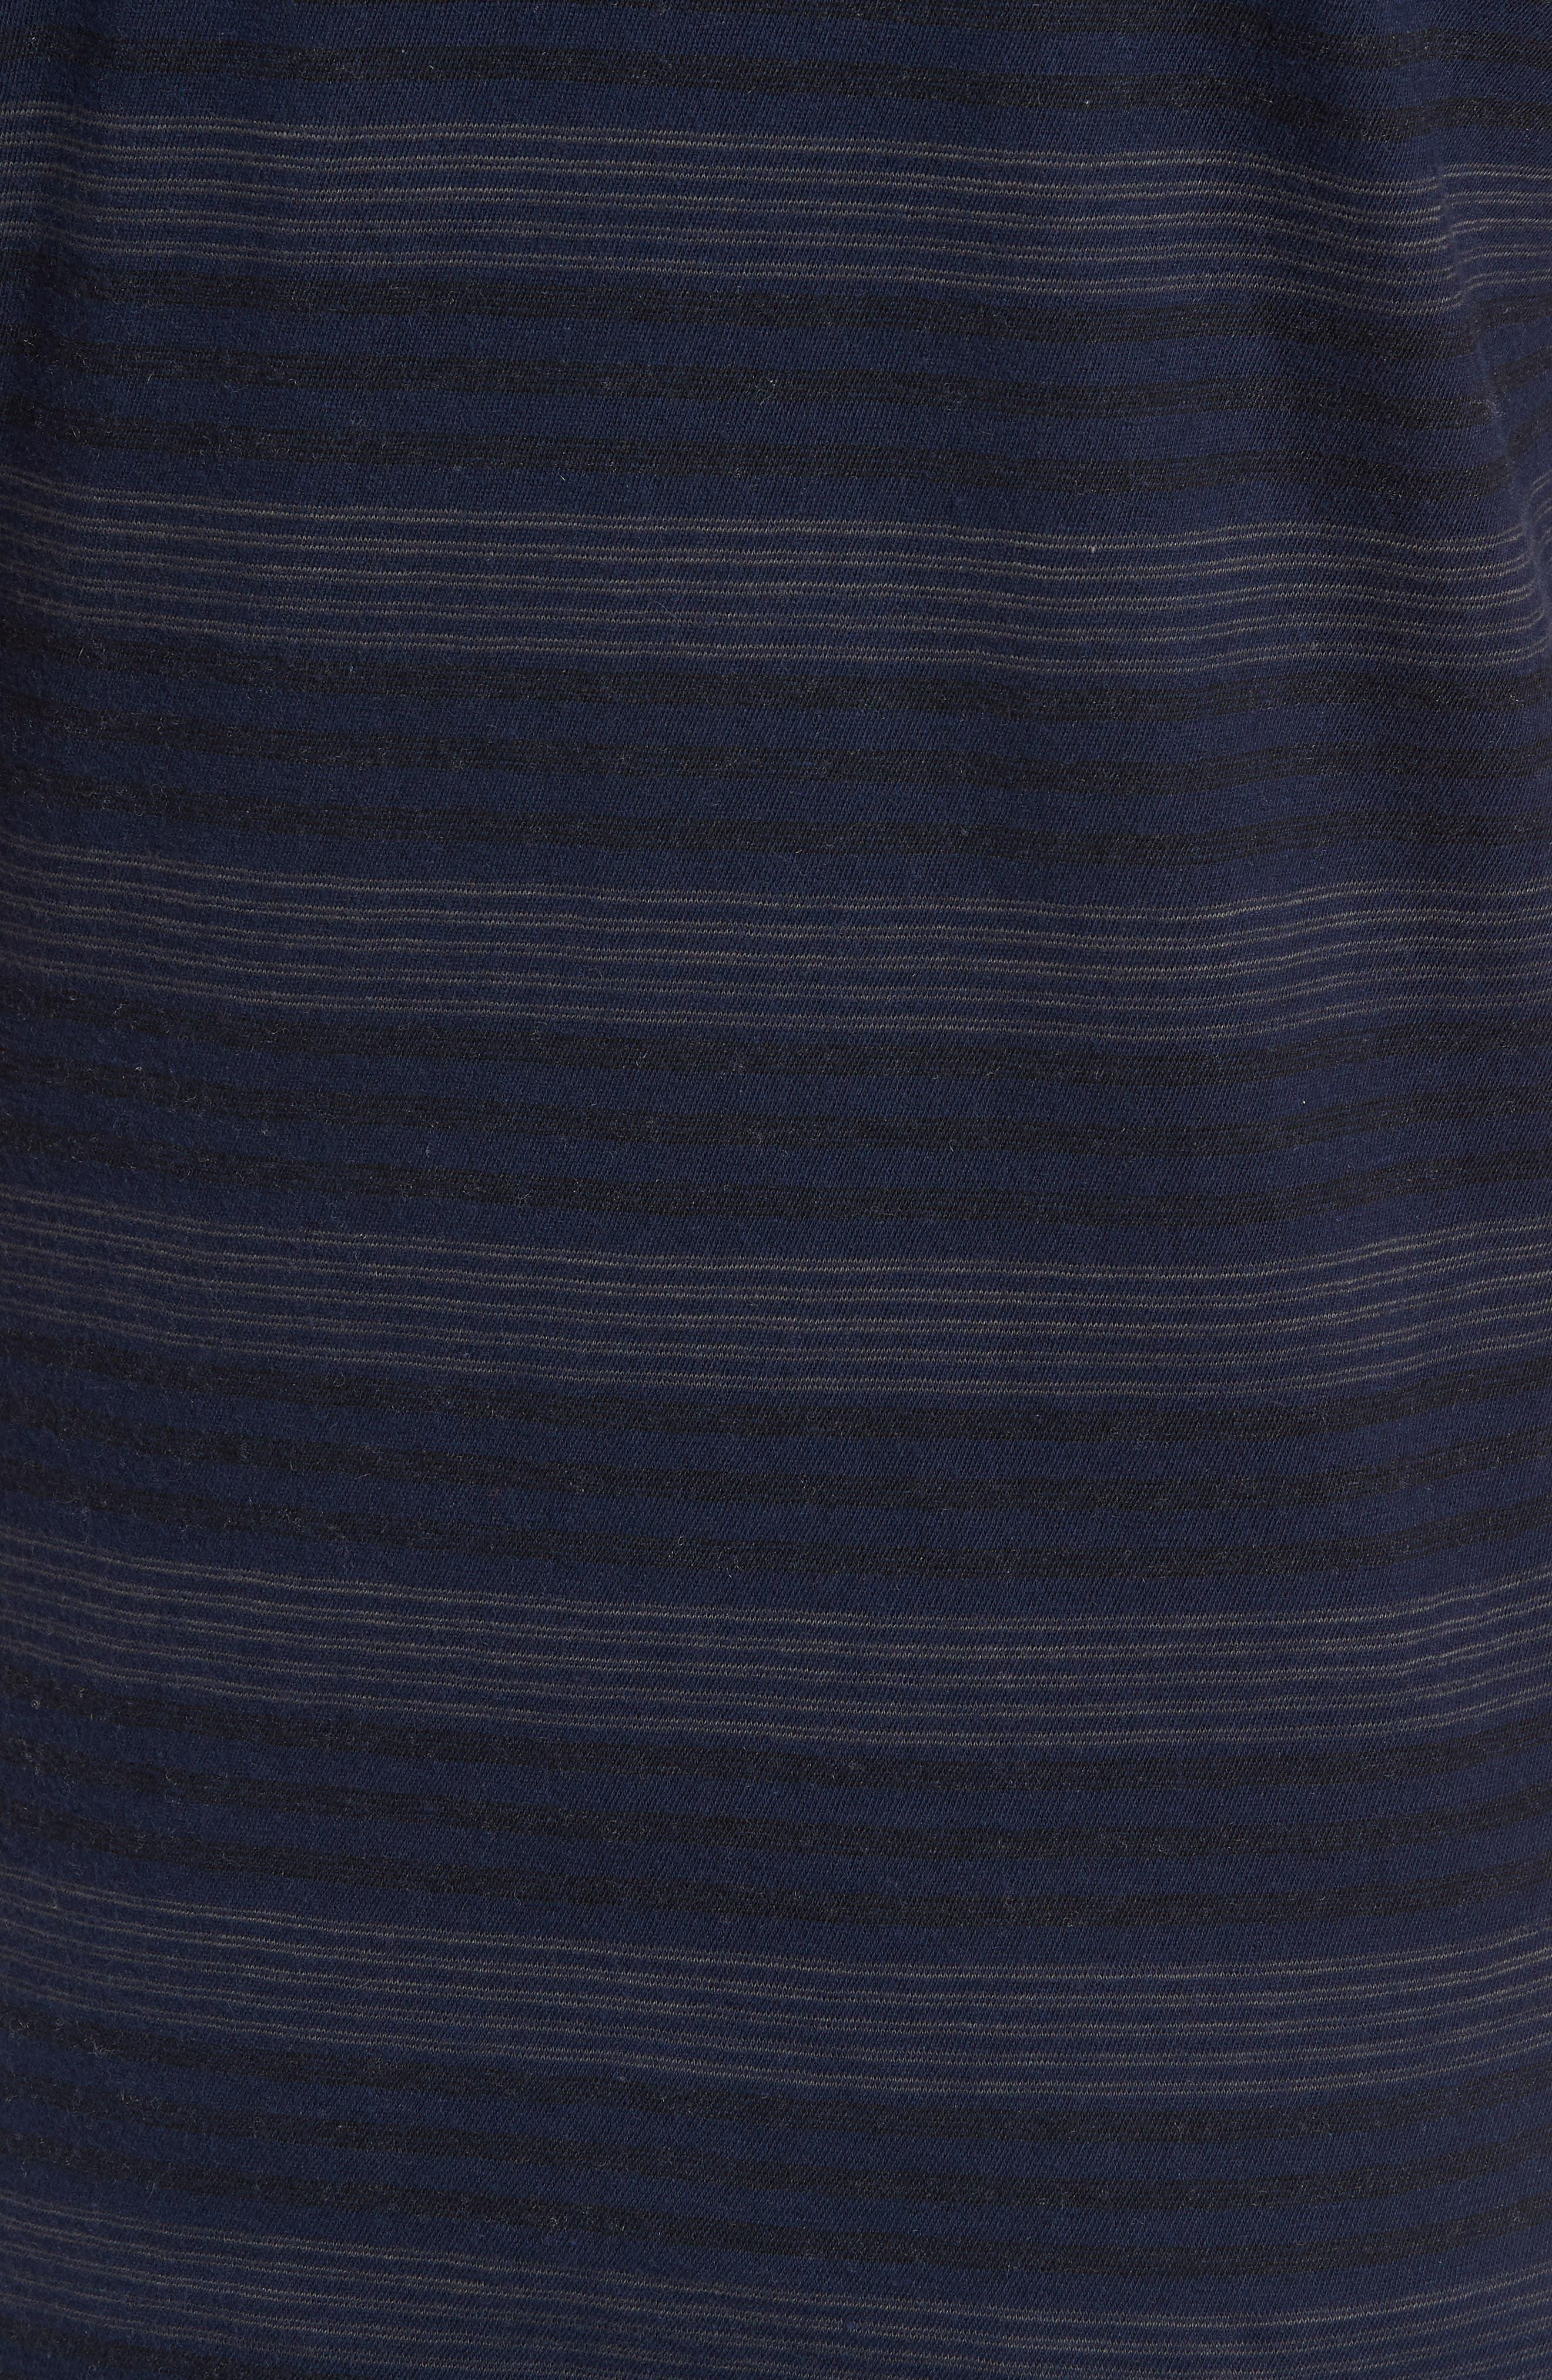 Stripe Cotton & Cashmere Polo Shirt,                             Alternate thumbnail 5, color,                             410